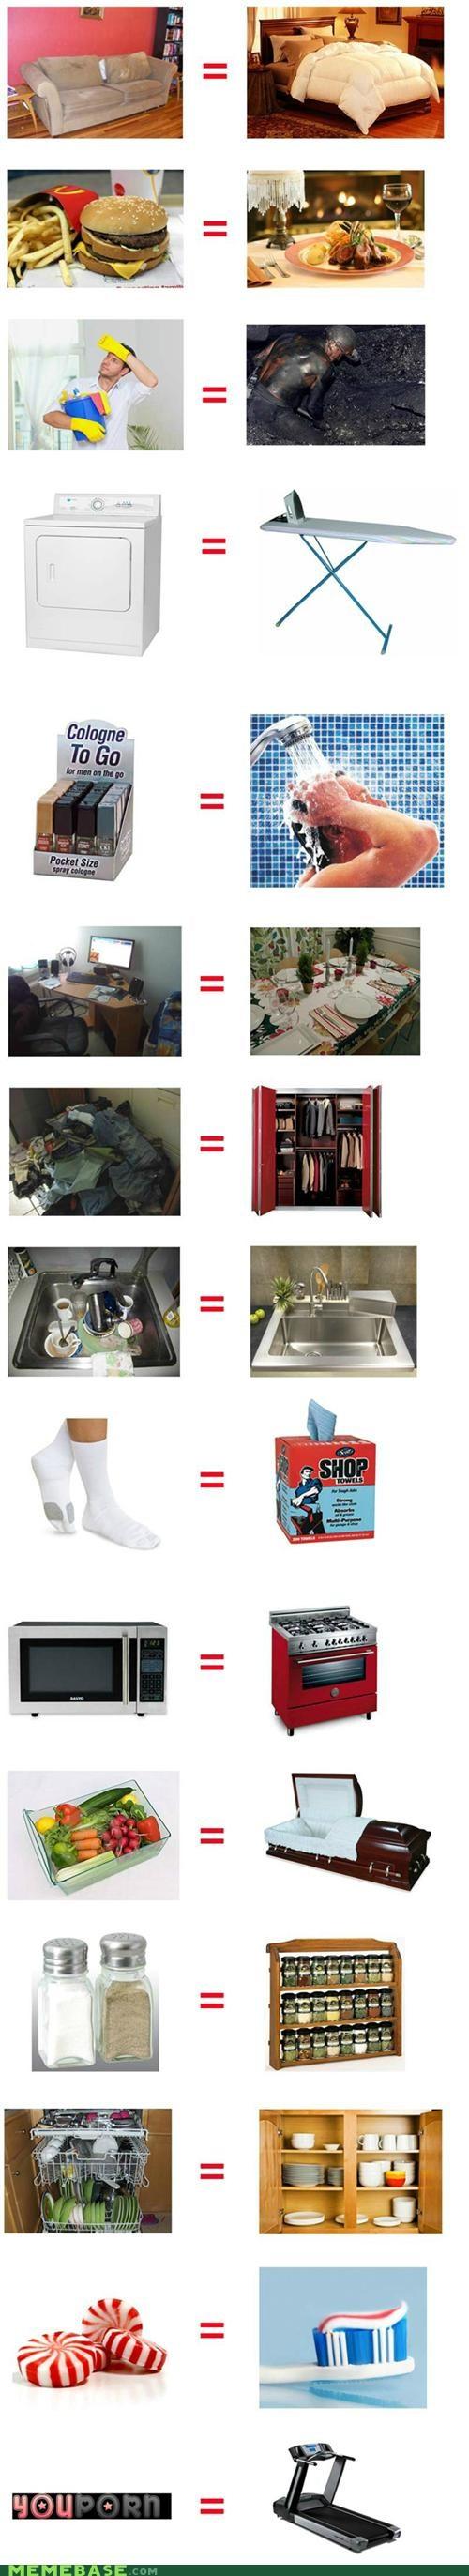 bachelor,chores,foul bachelor frog,guide,hard,life